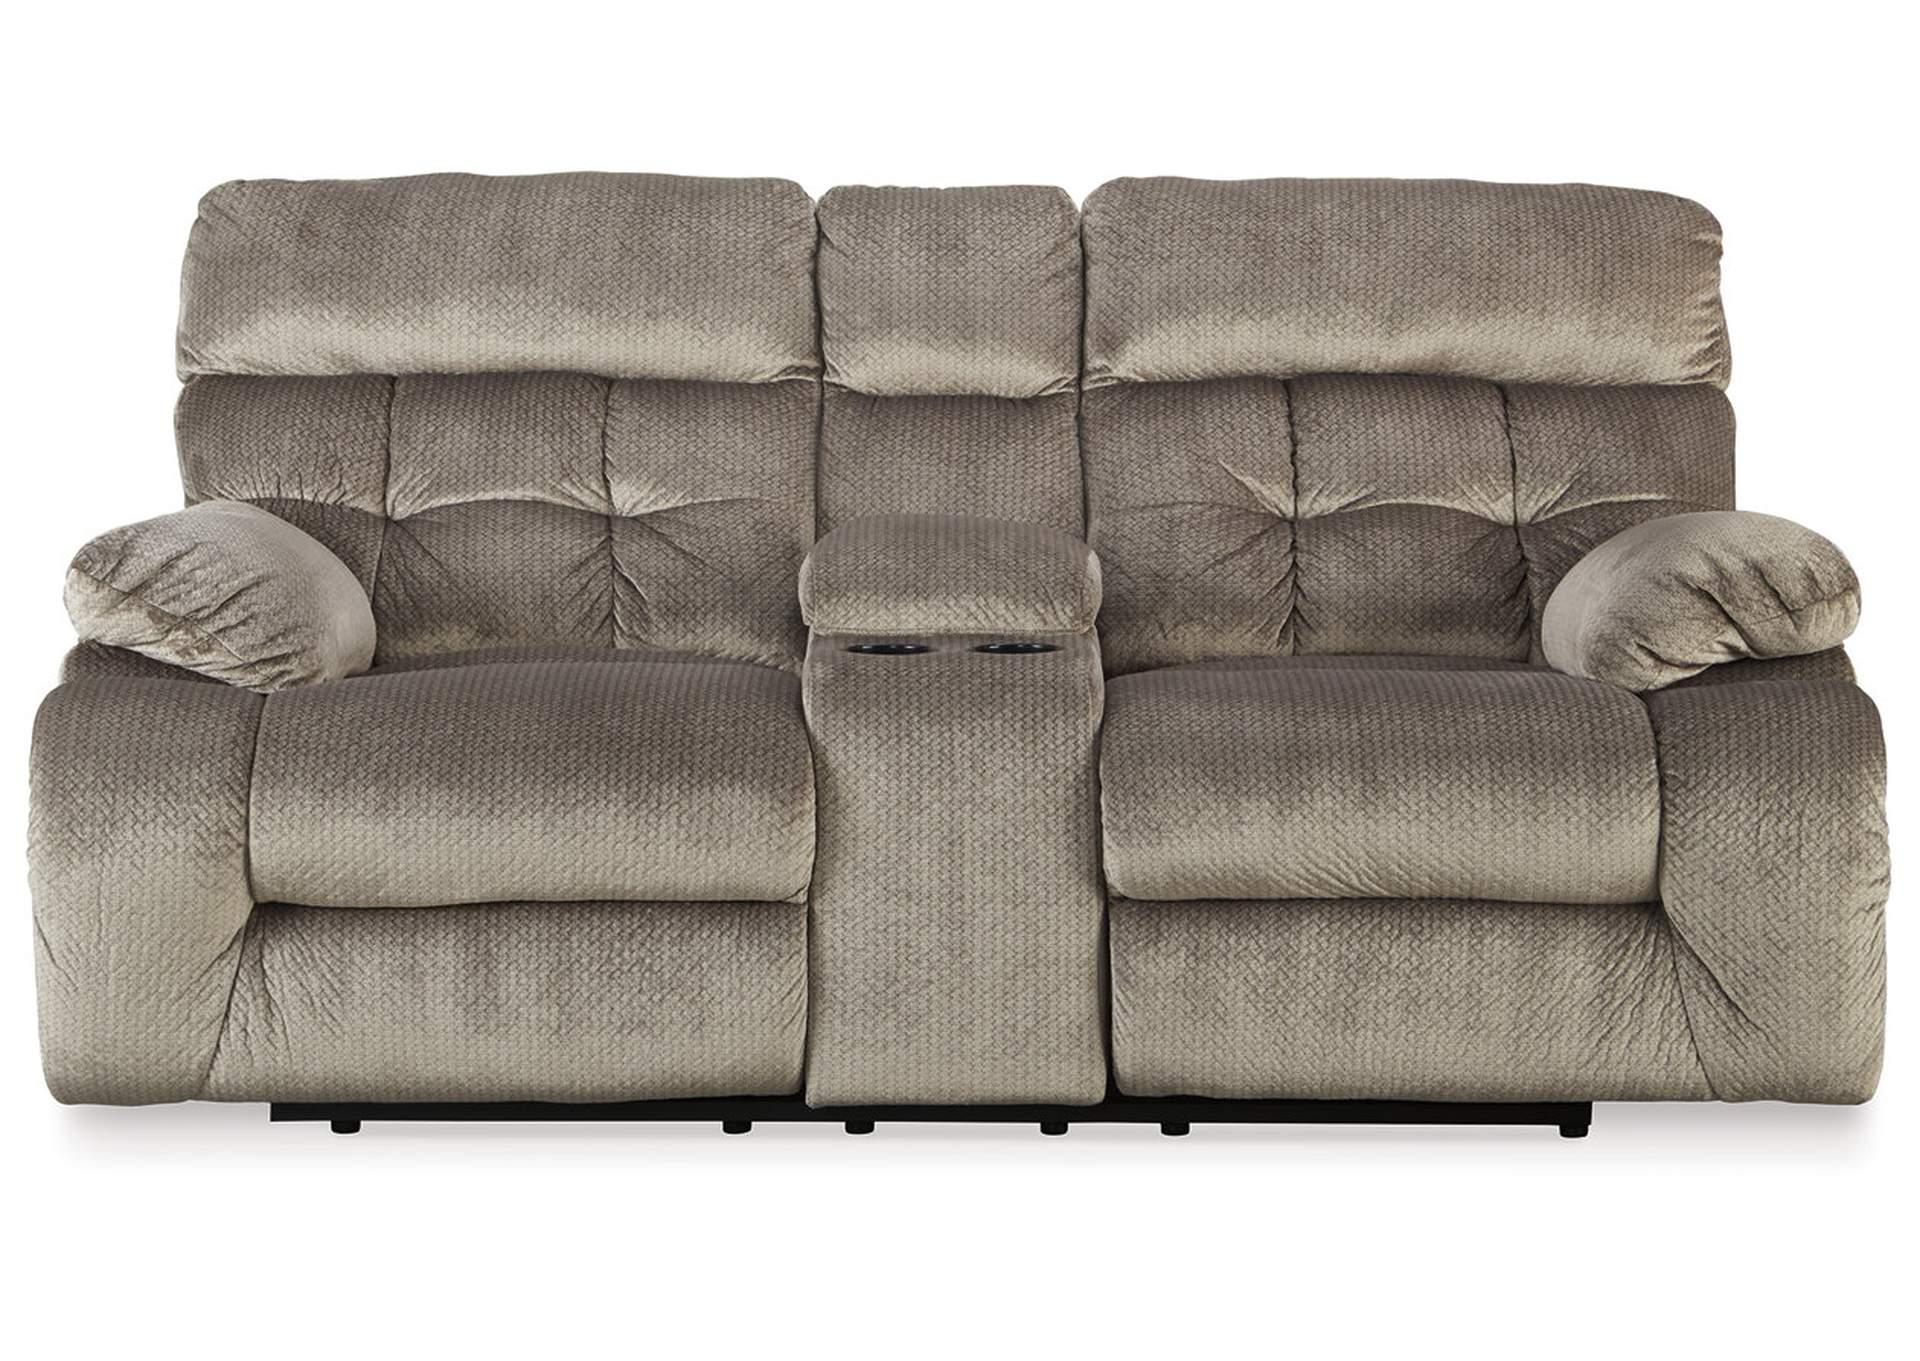 Loveseat (sofá de dos plazas) reclinable eléctrico doble Brassville color gris piedra con mesa trasofa/arrimo   PEDIDO ESPECIAL